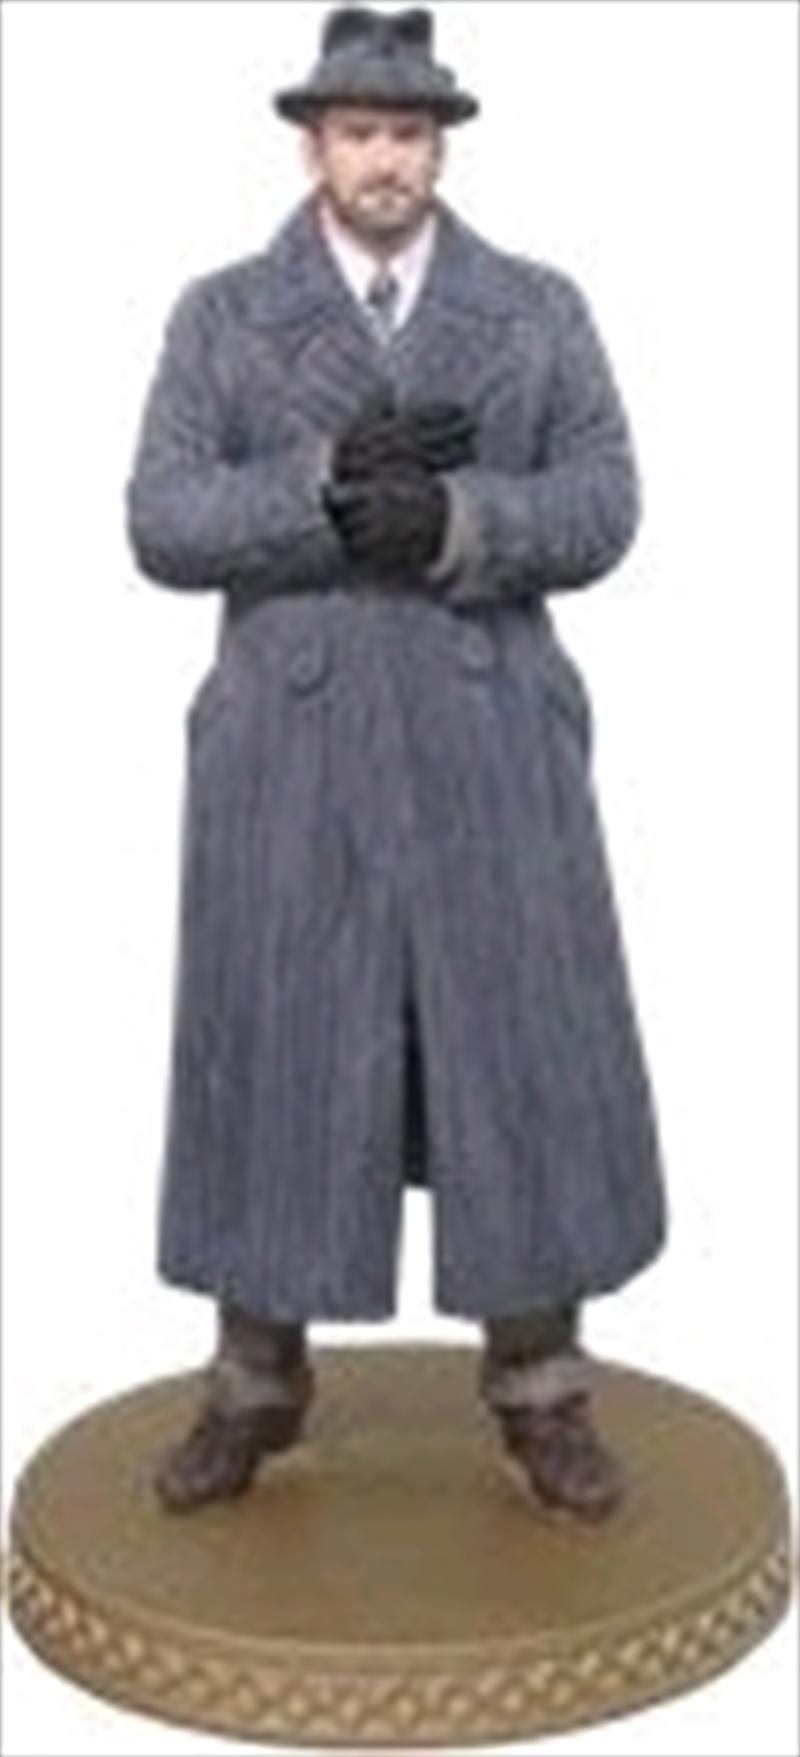 Fantastic Beasts 2 The Crimes of Grindelwald - Albus Dumbledore 1:16 Figure & Magazine | Merchandise